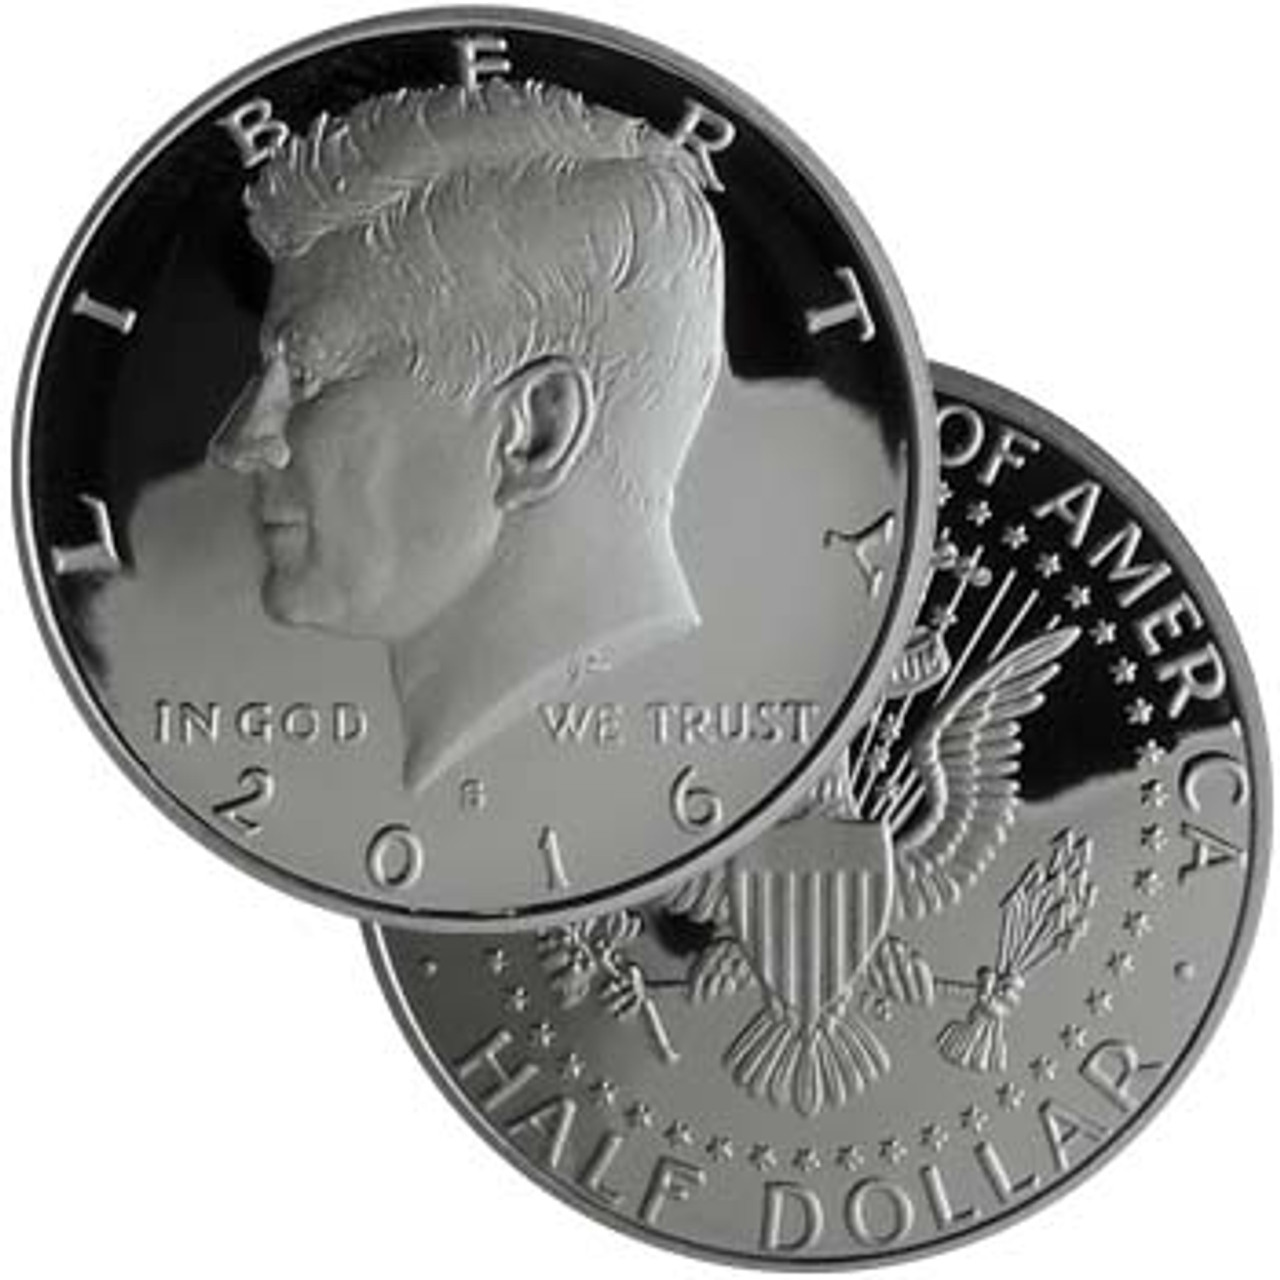 2016-S Kennedy Half Dollar Proof Image 1